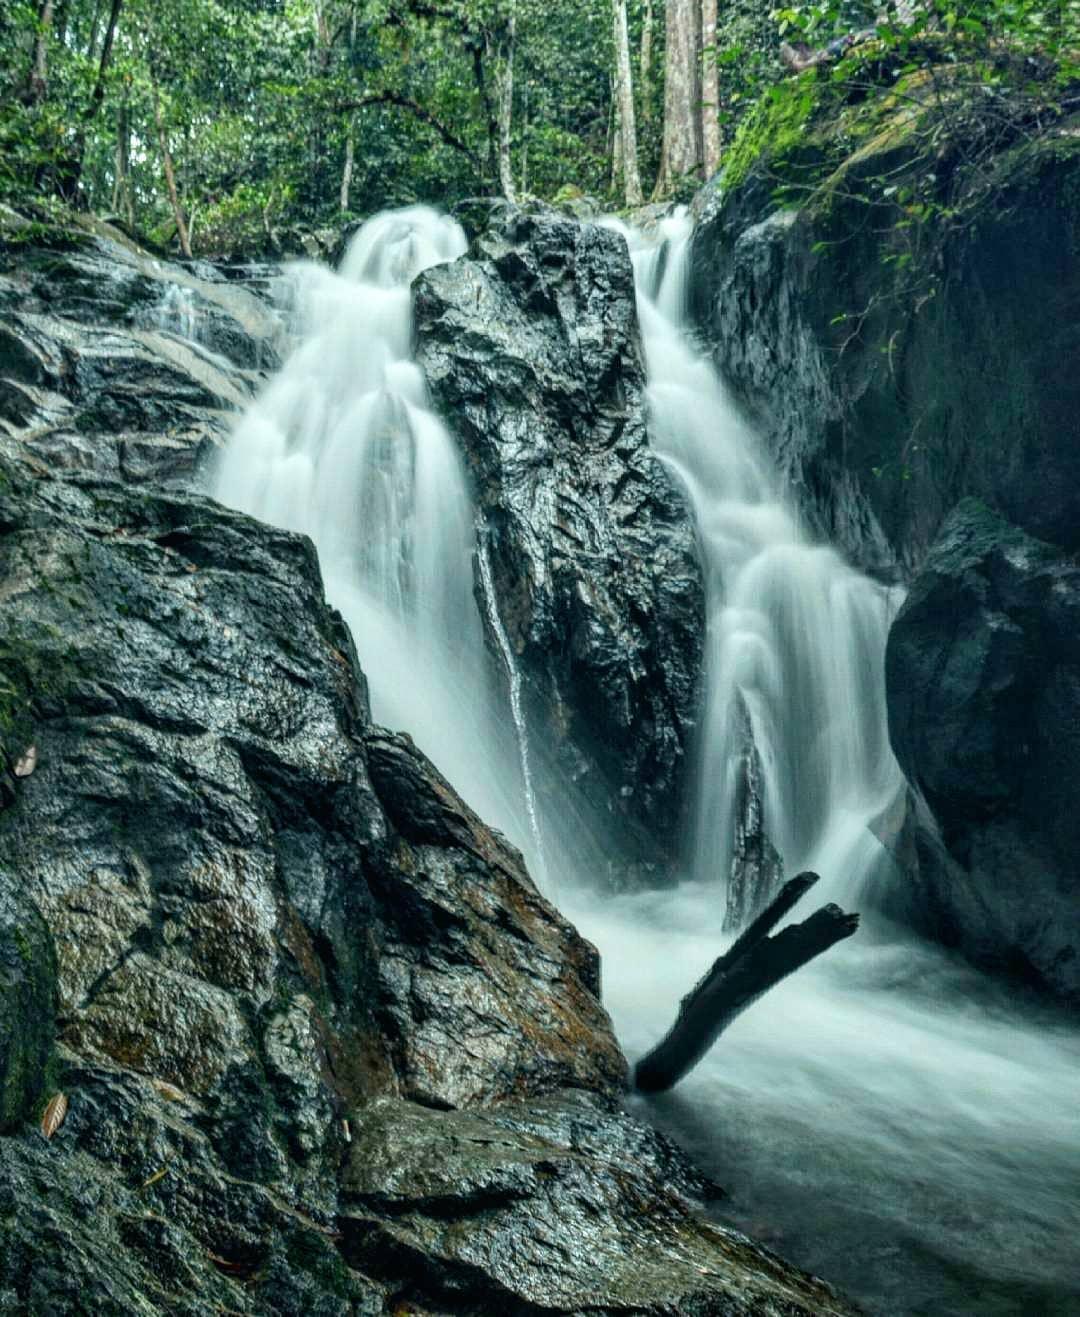 5 Lokasi Air Terjun Menarik Untuk Anda Mandi Manda Di Selangor Best Teruk Libur